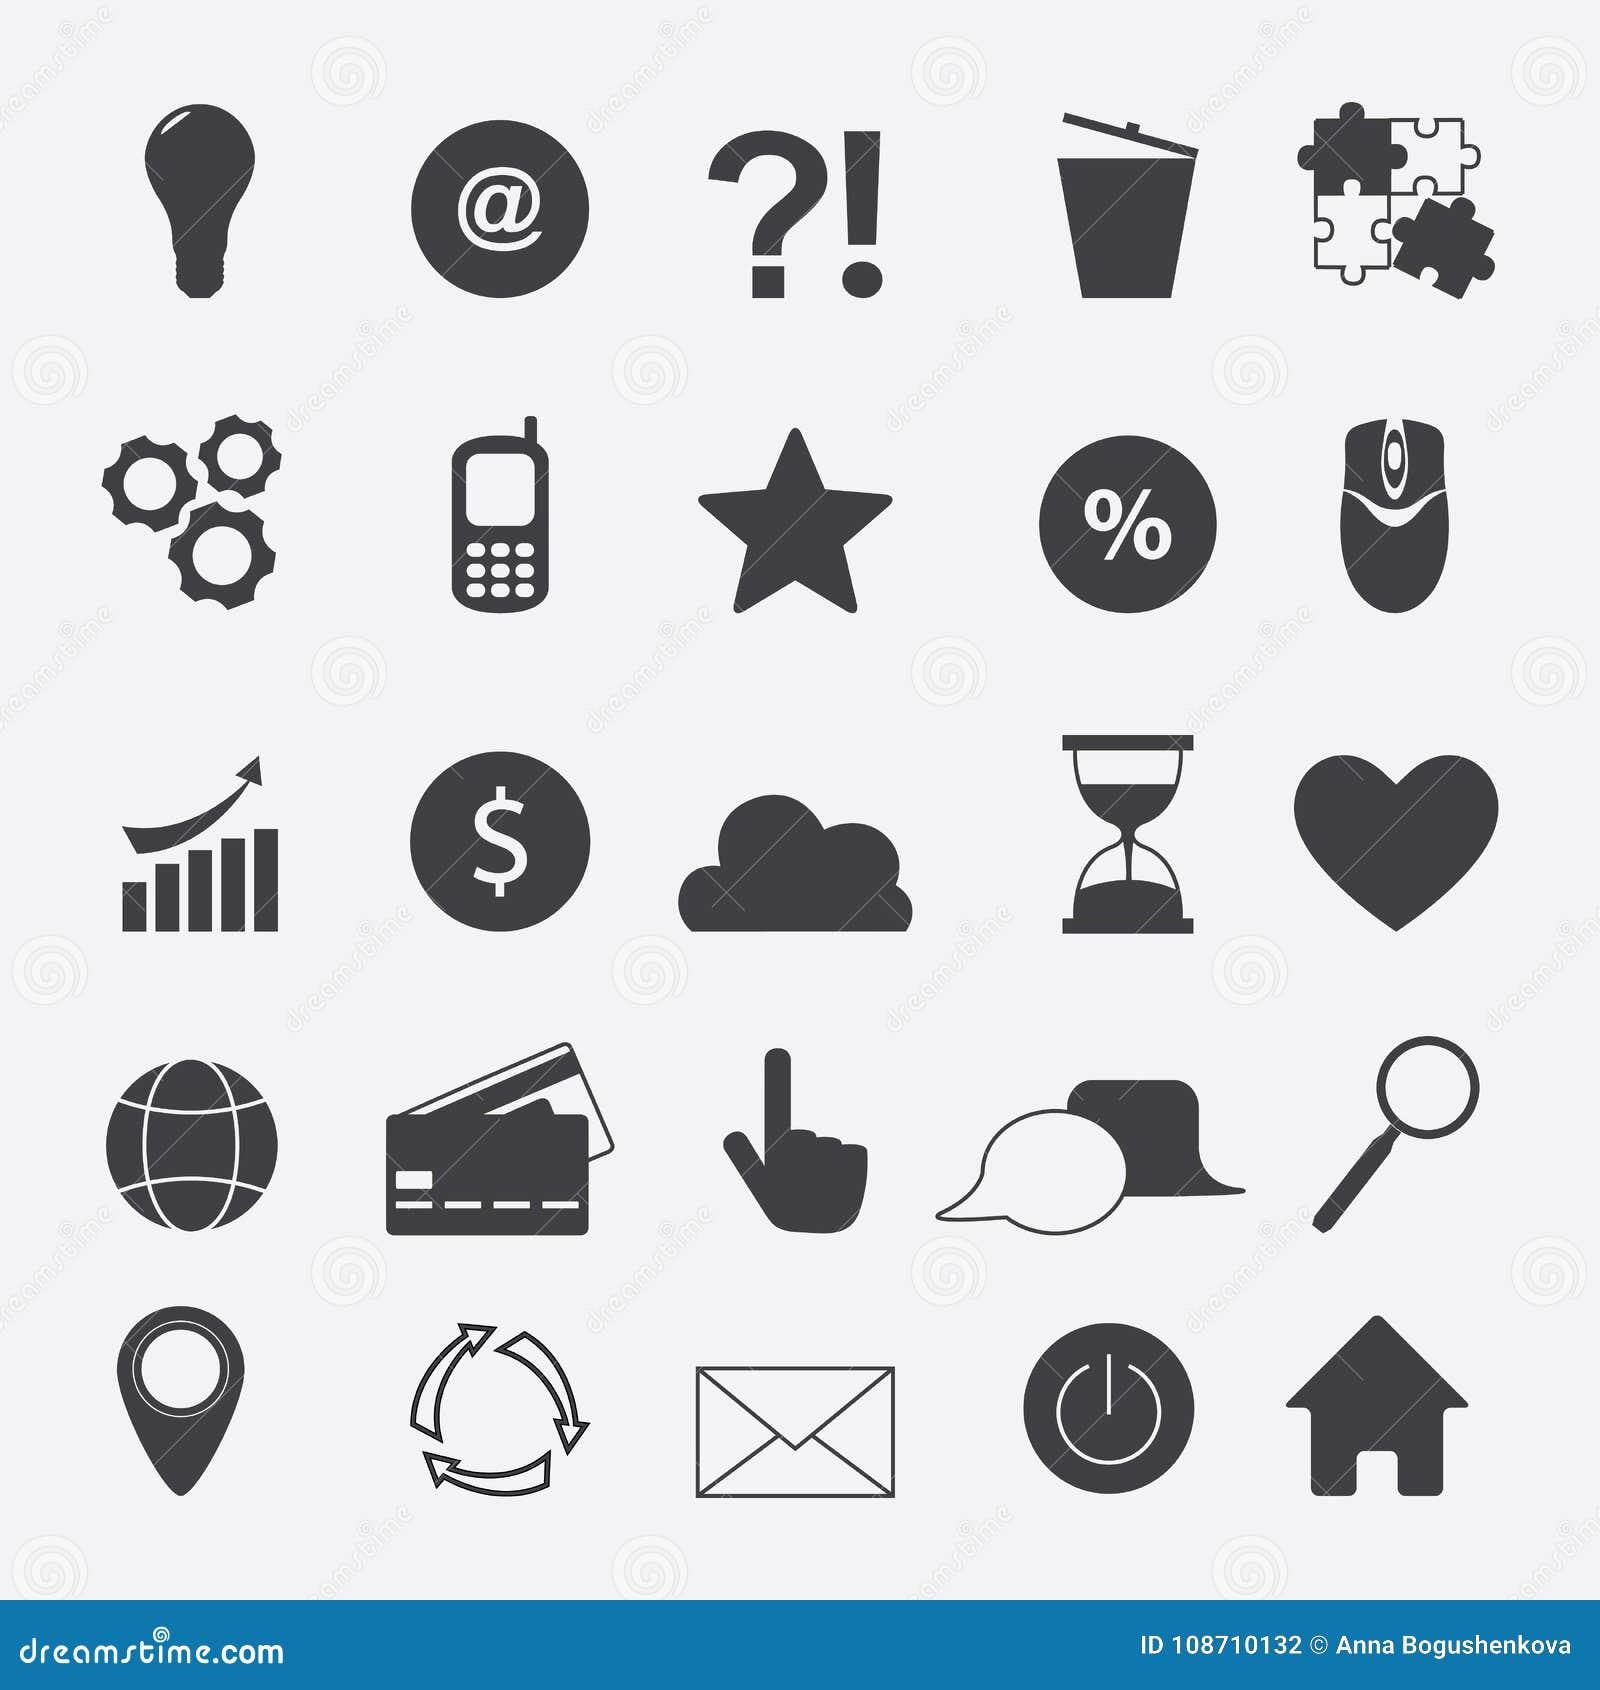 Internet Flat Symbols For Web Site Design Isolated On Grey